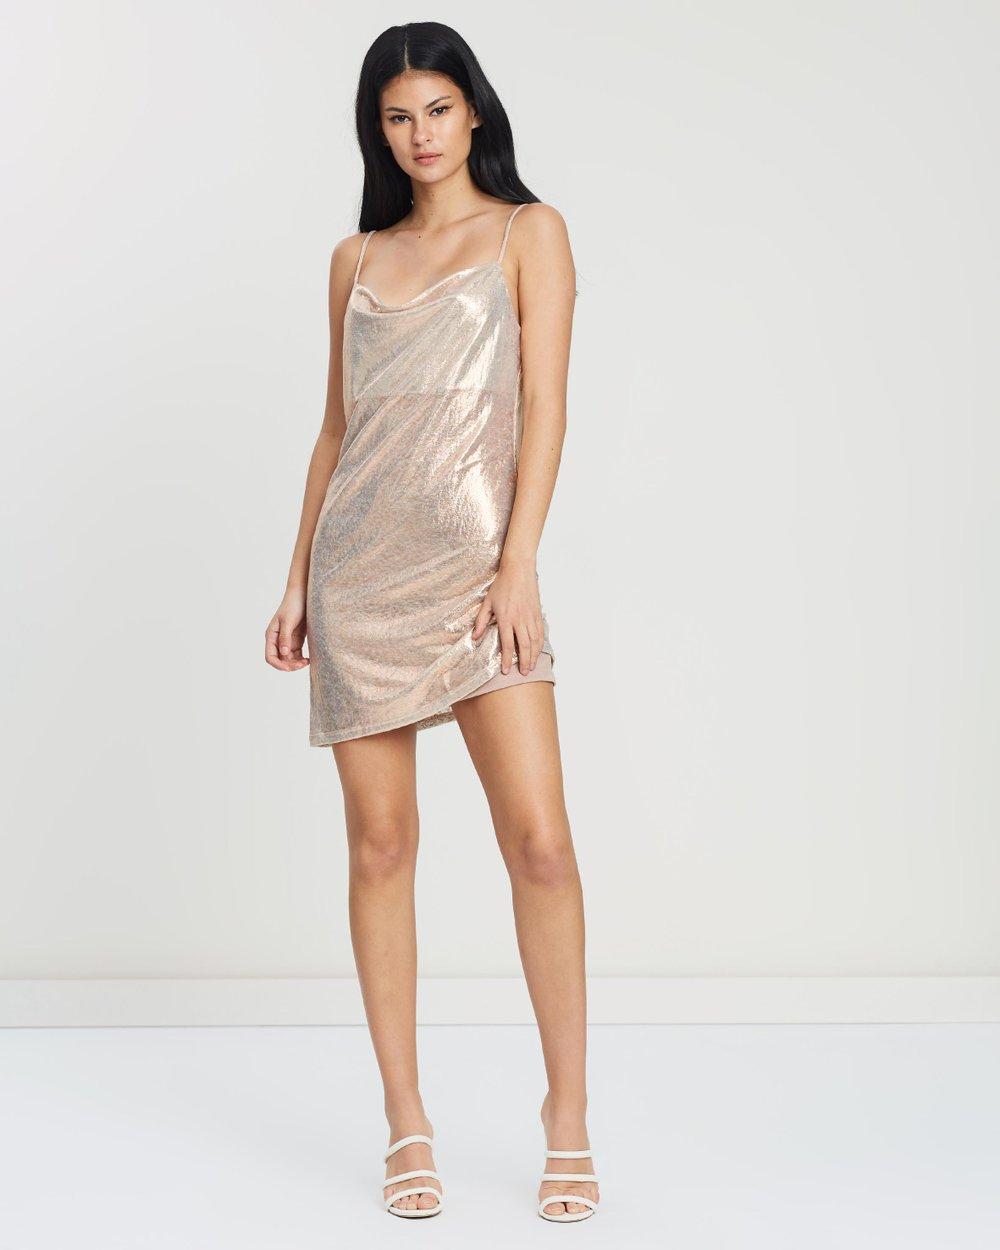 64fe774620b61 Metallic Cowl Neck Body-Con Dress by Miss Selfridge Online | THE ICONIC |  Australia